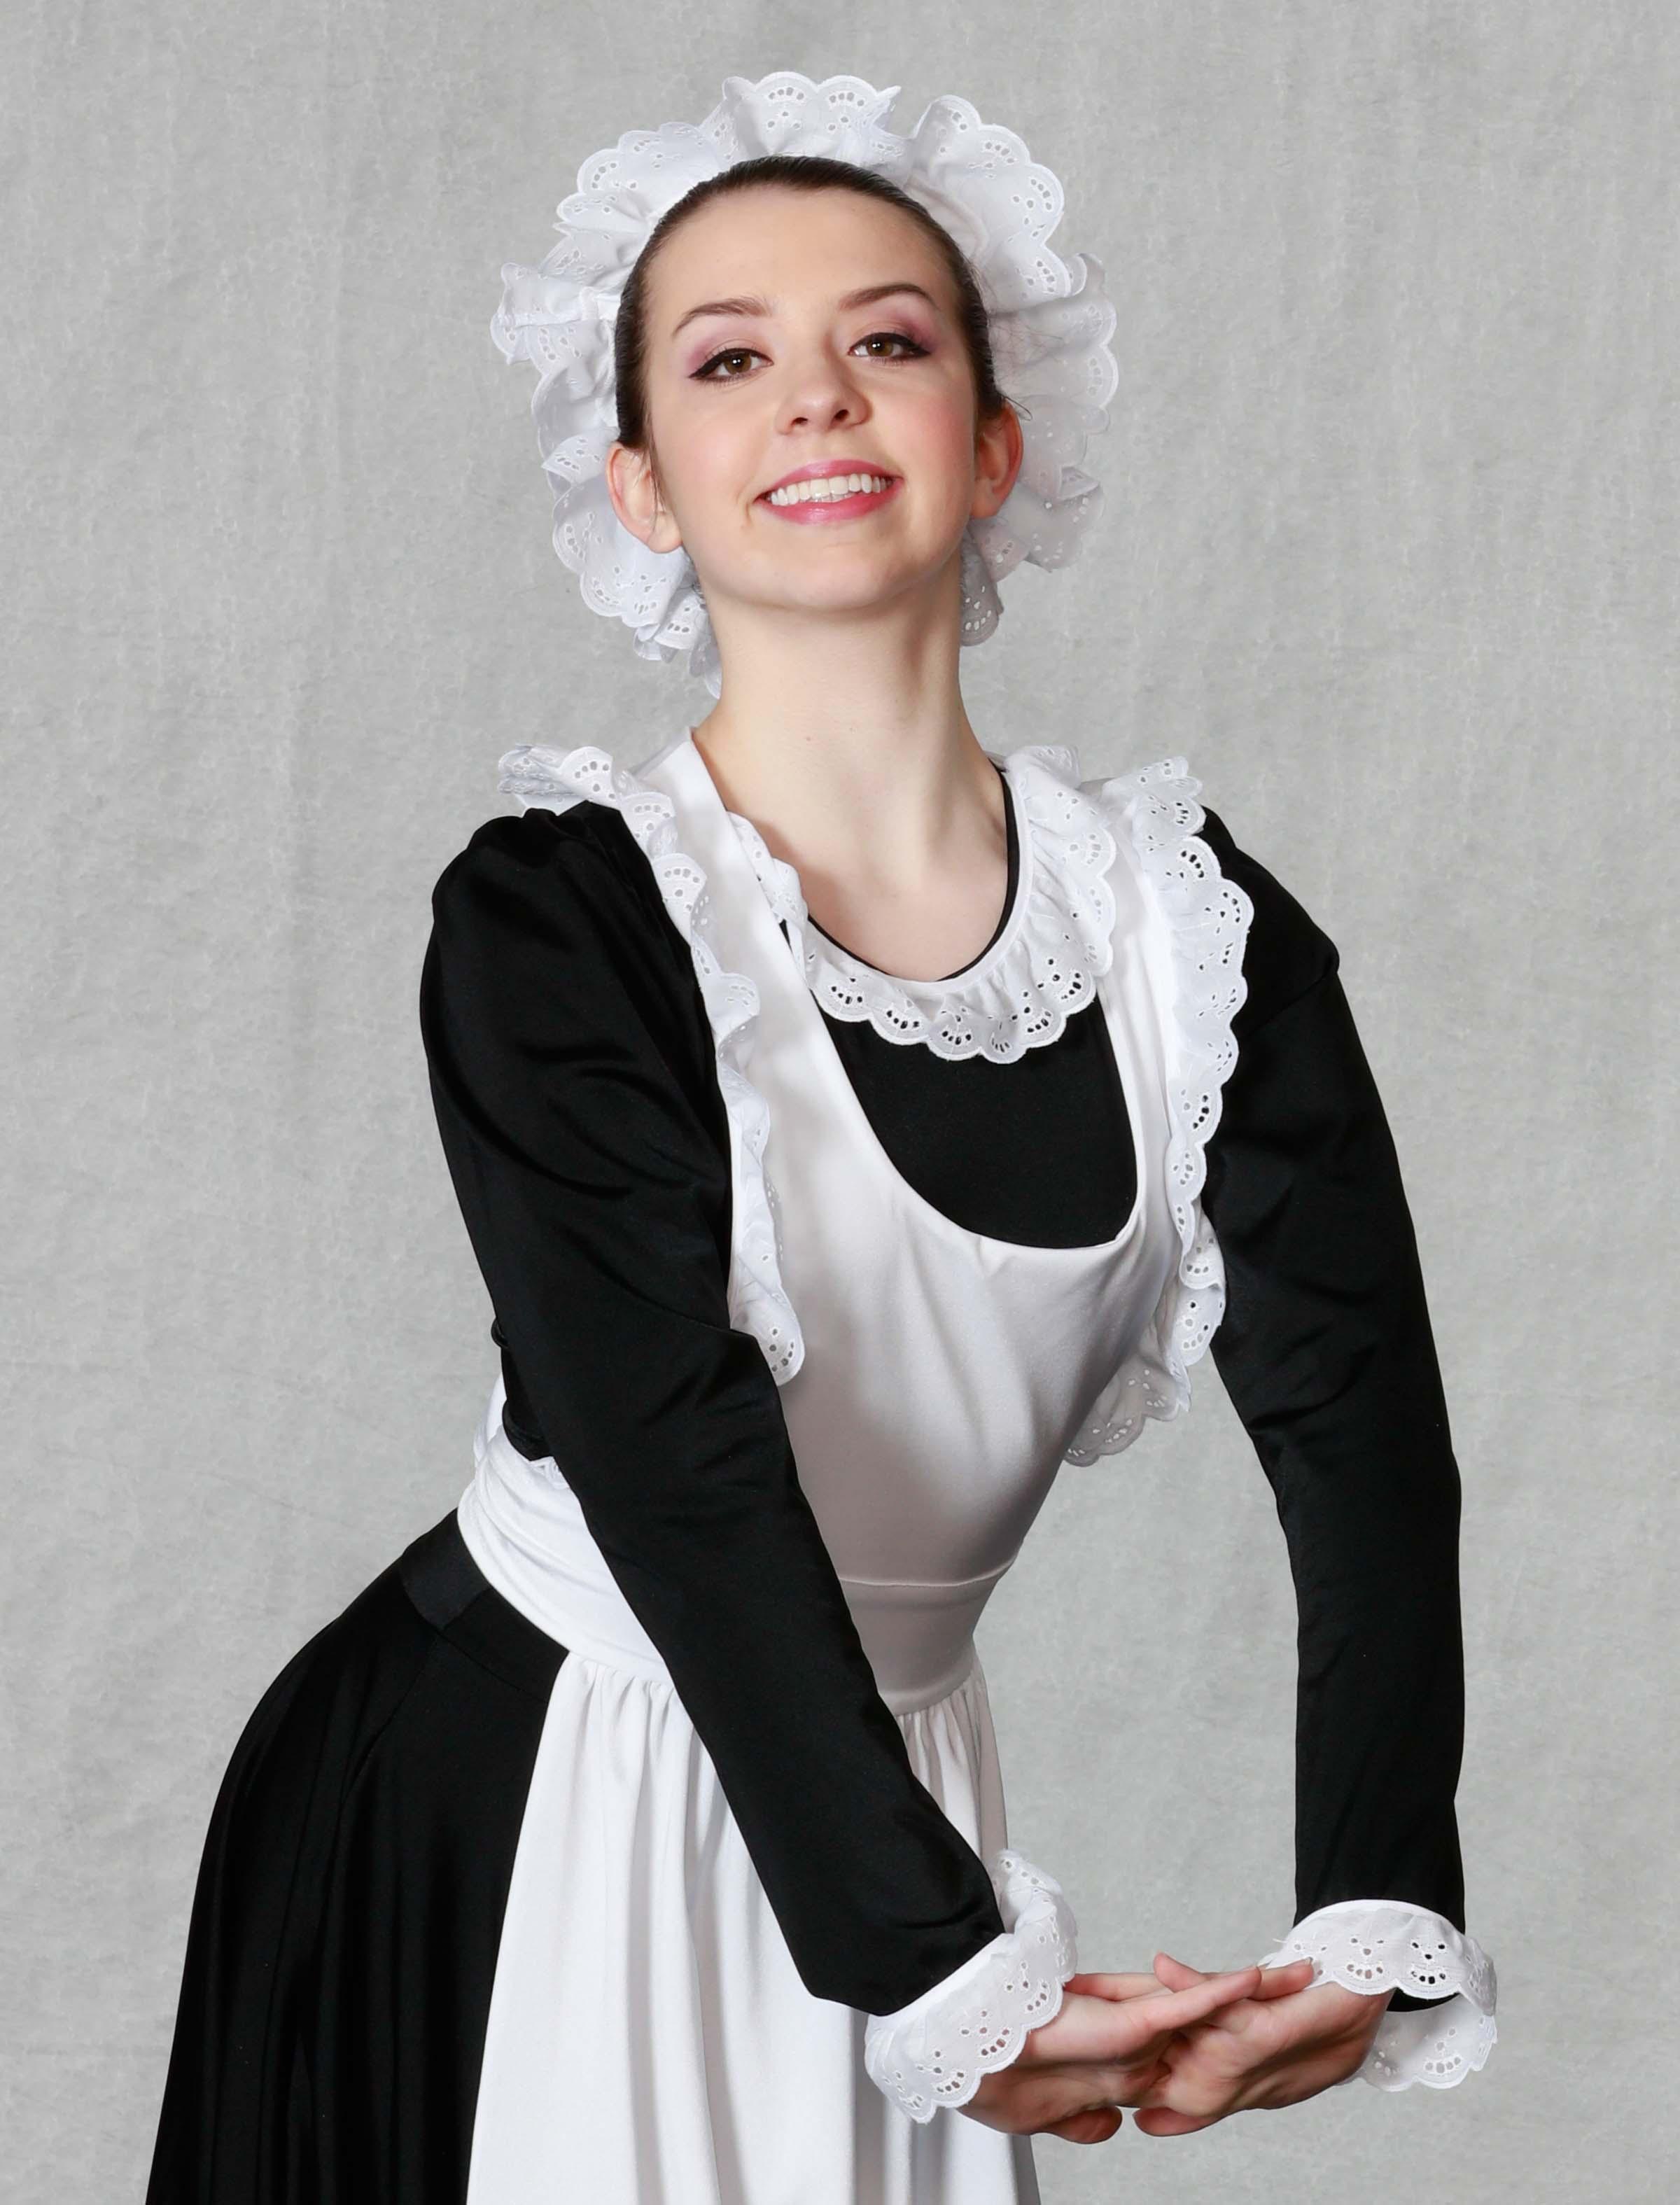 Georgie Girl Costumes Nutcracker Cheerful Maids